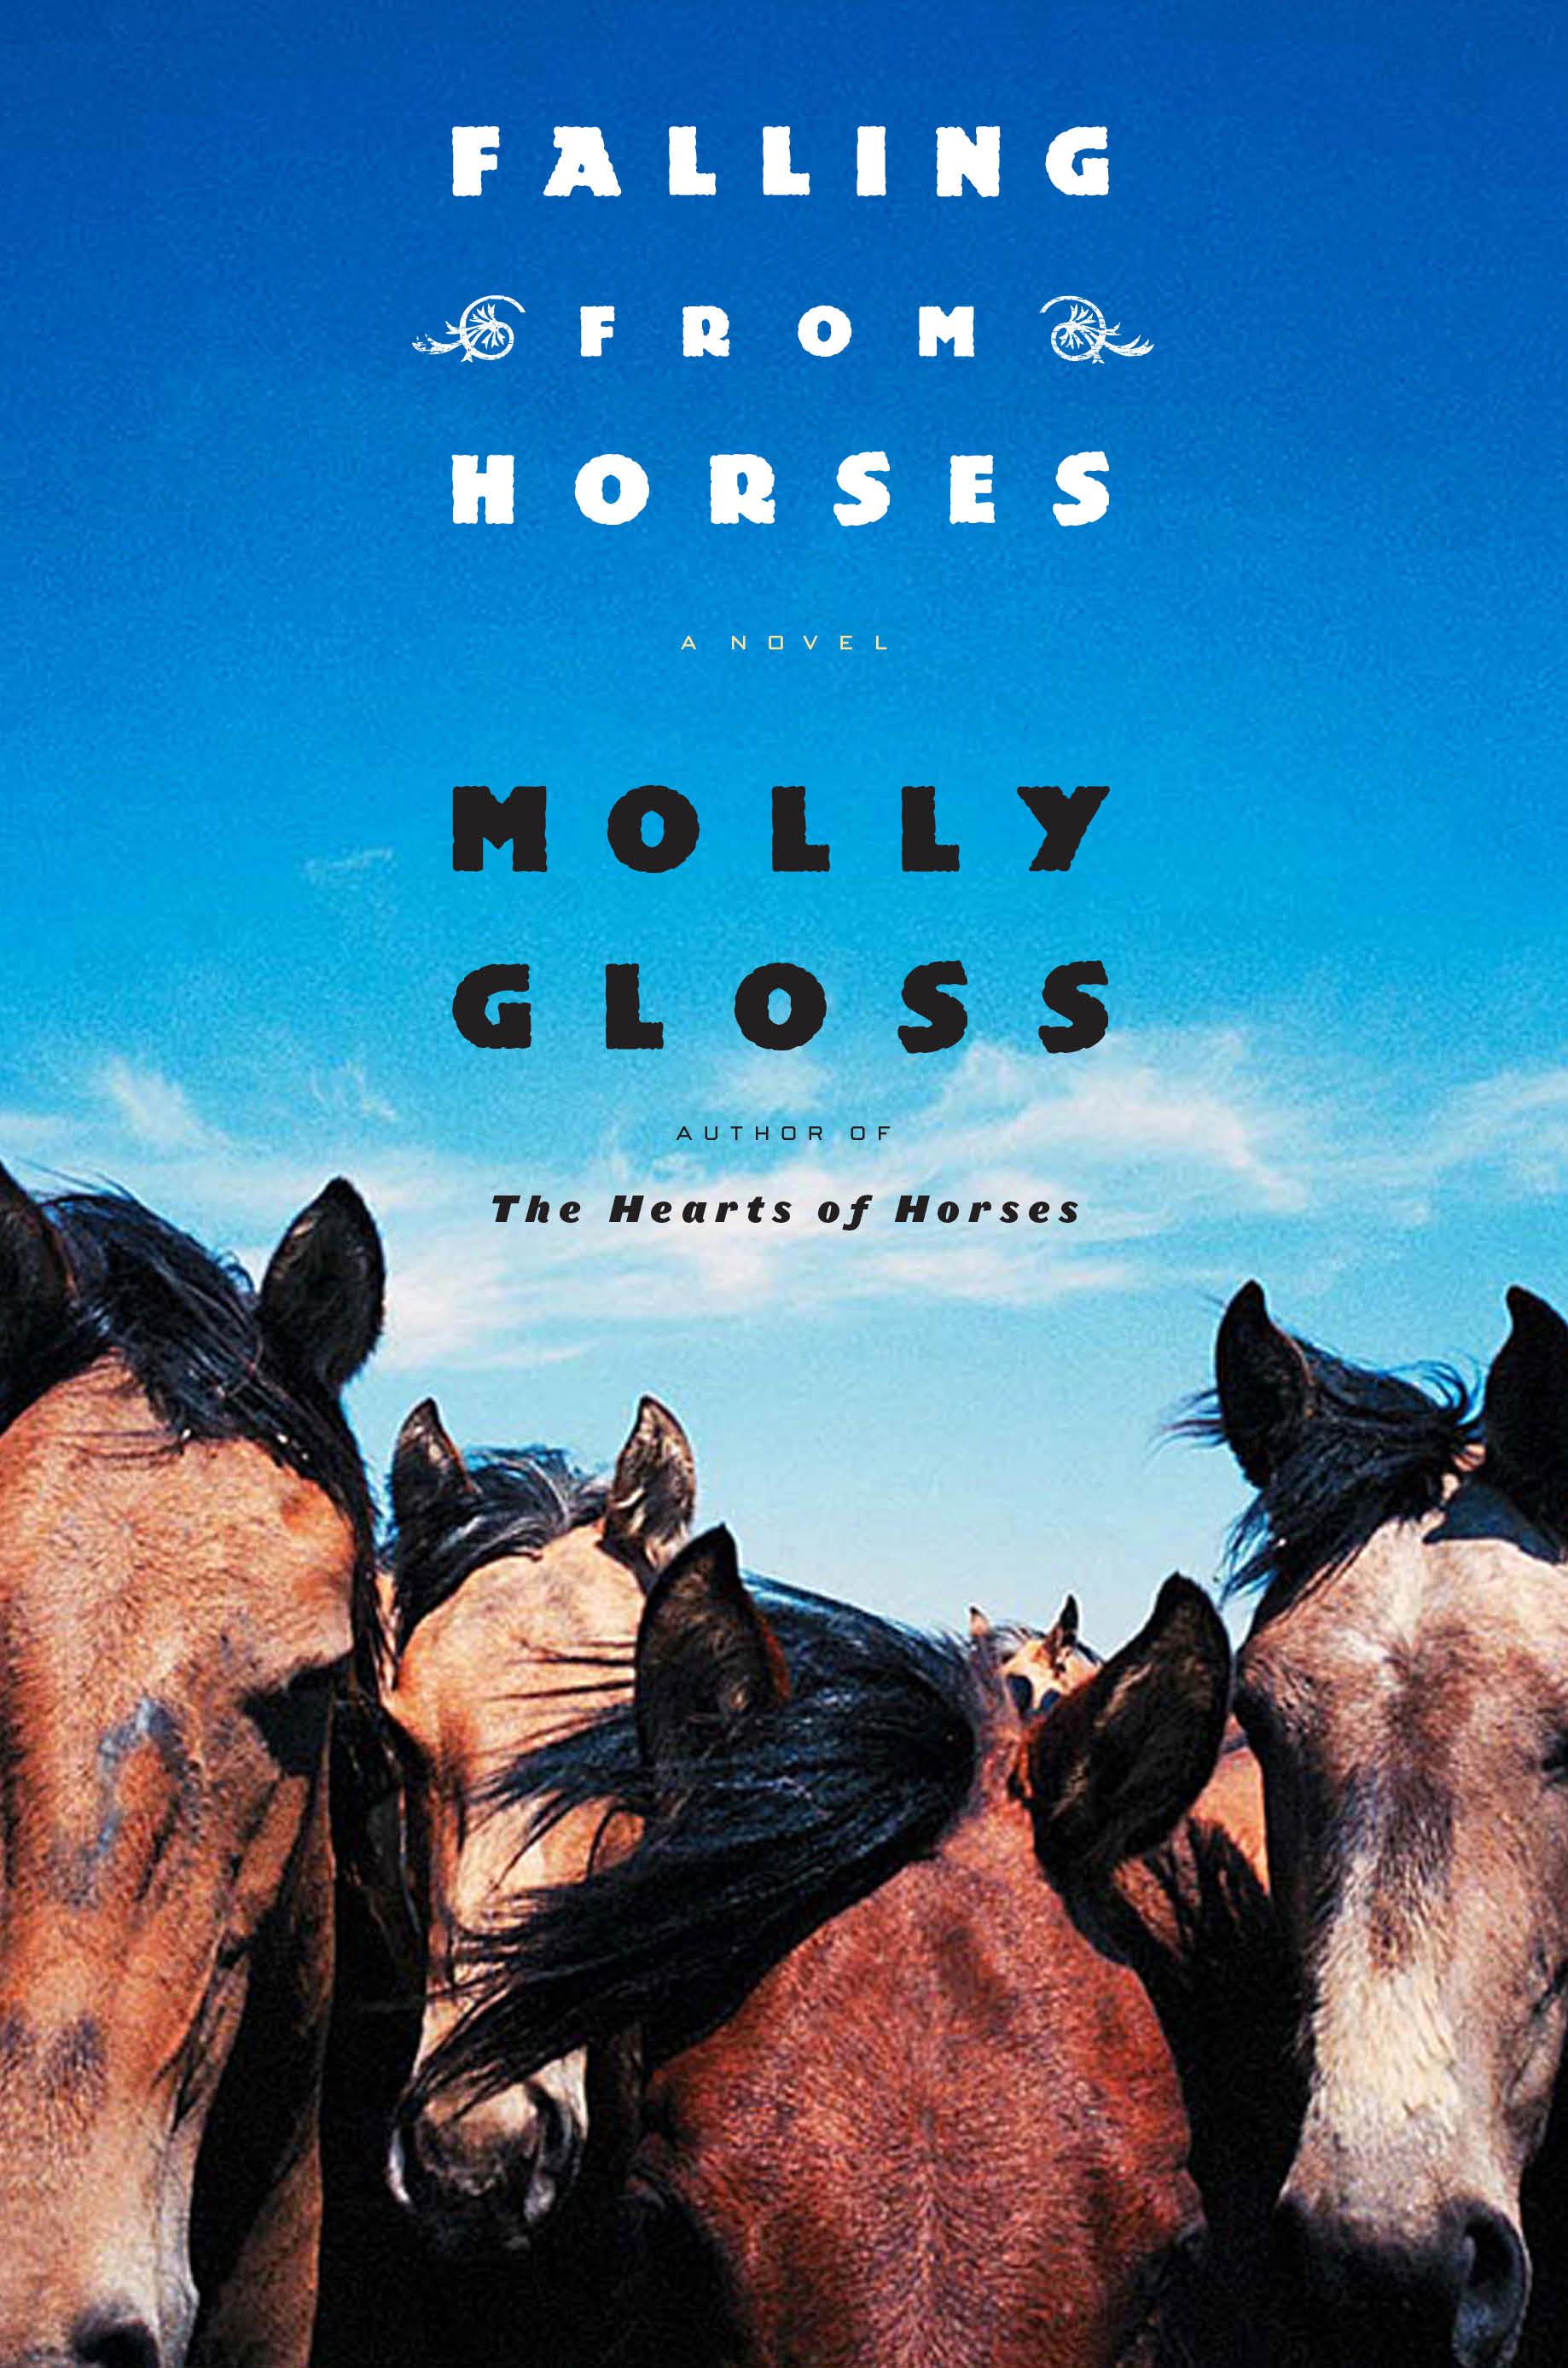 Gloss-Molly-FallingfromHorses-retouch.jpg